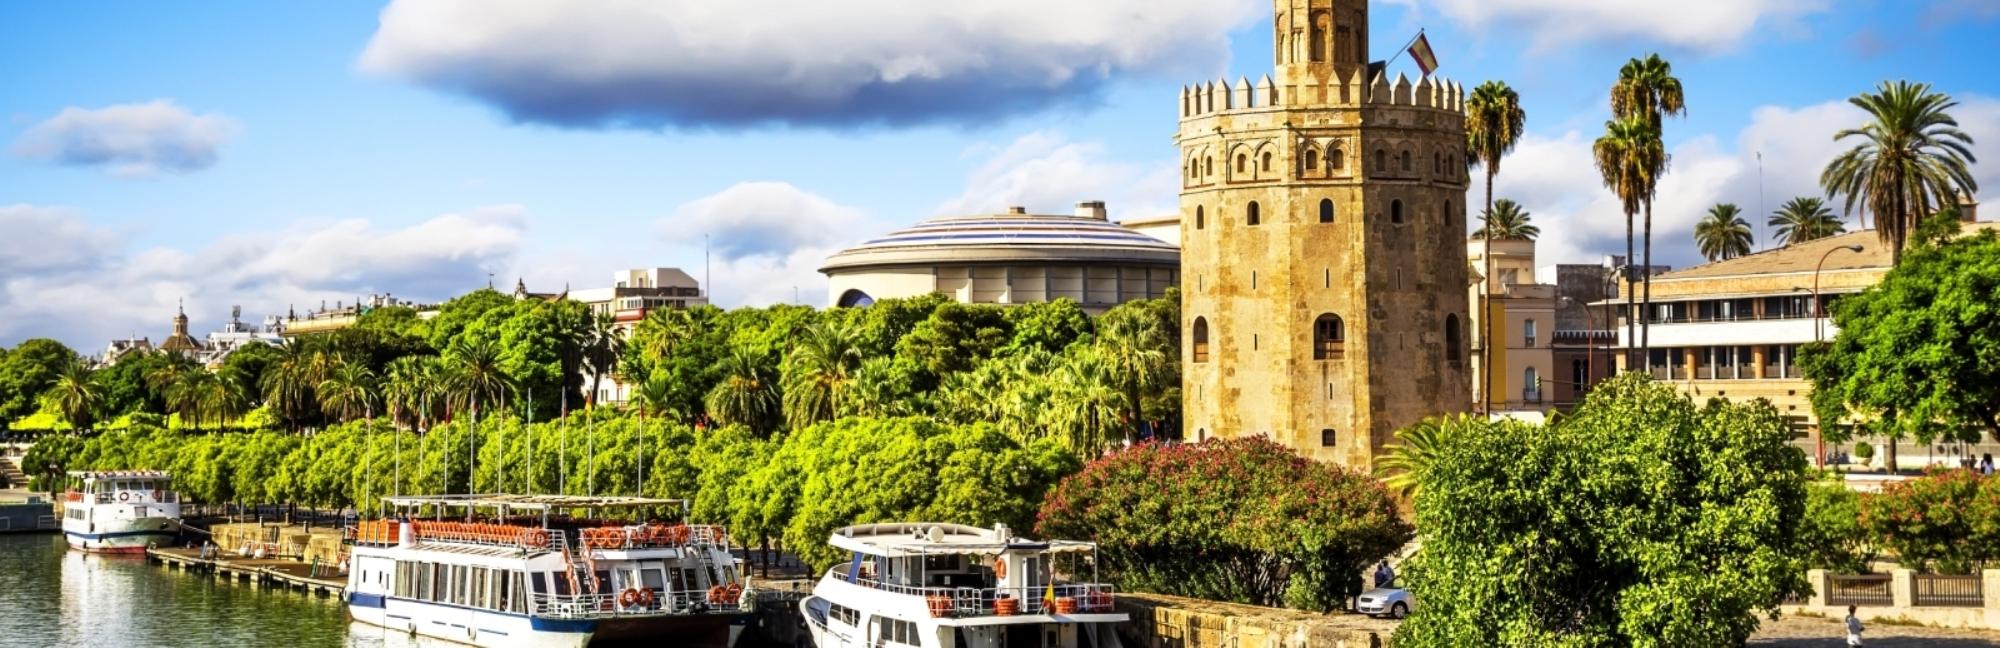 Barcelona | Andalucia & Mediterranean Coast